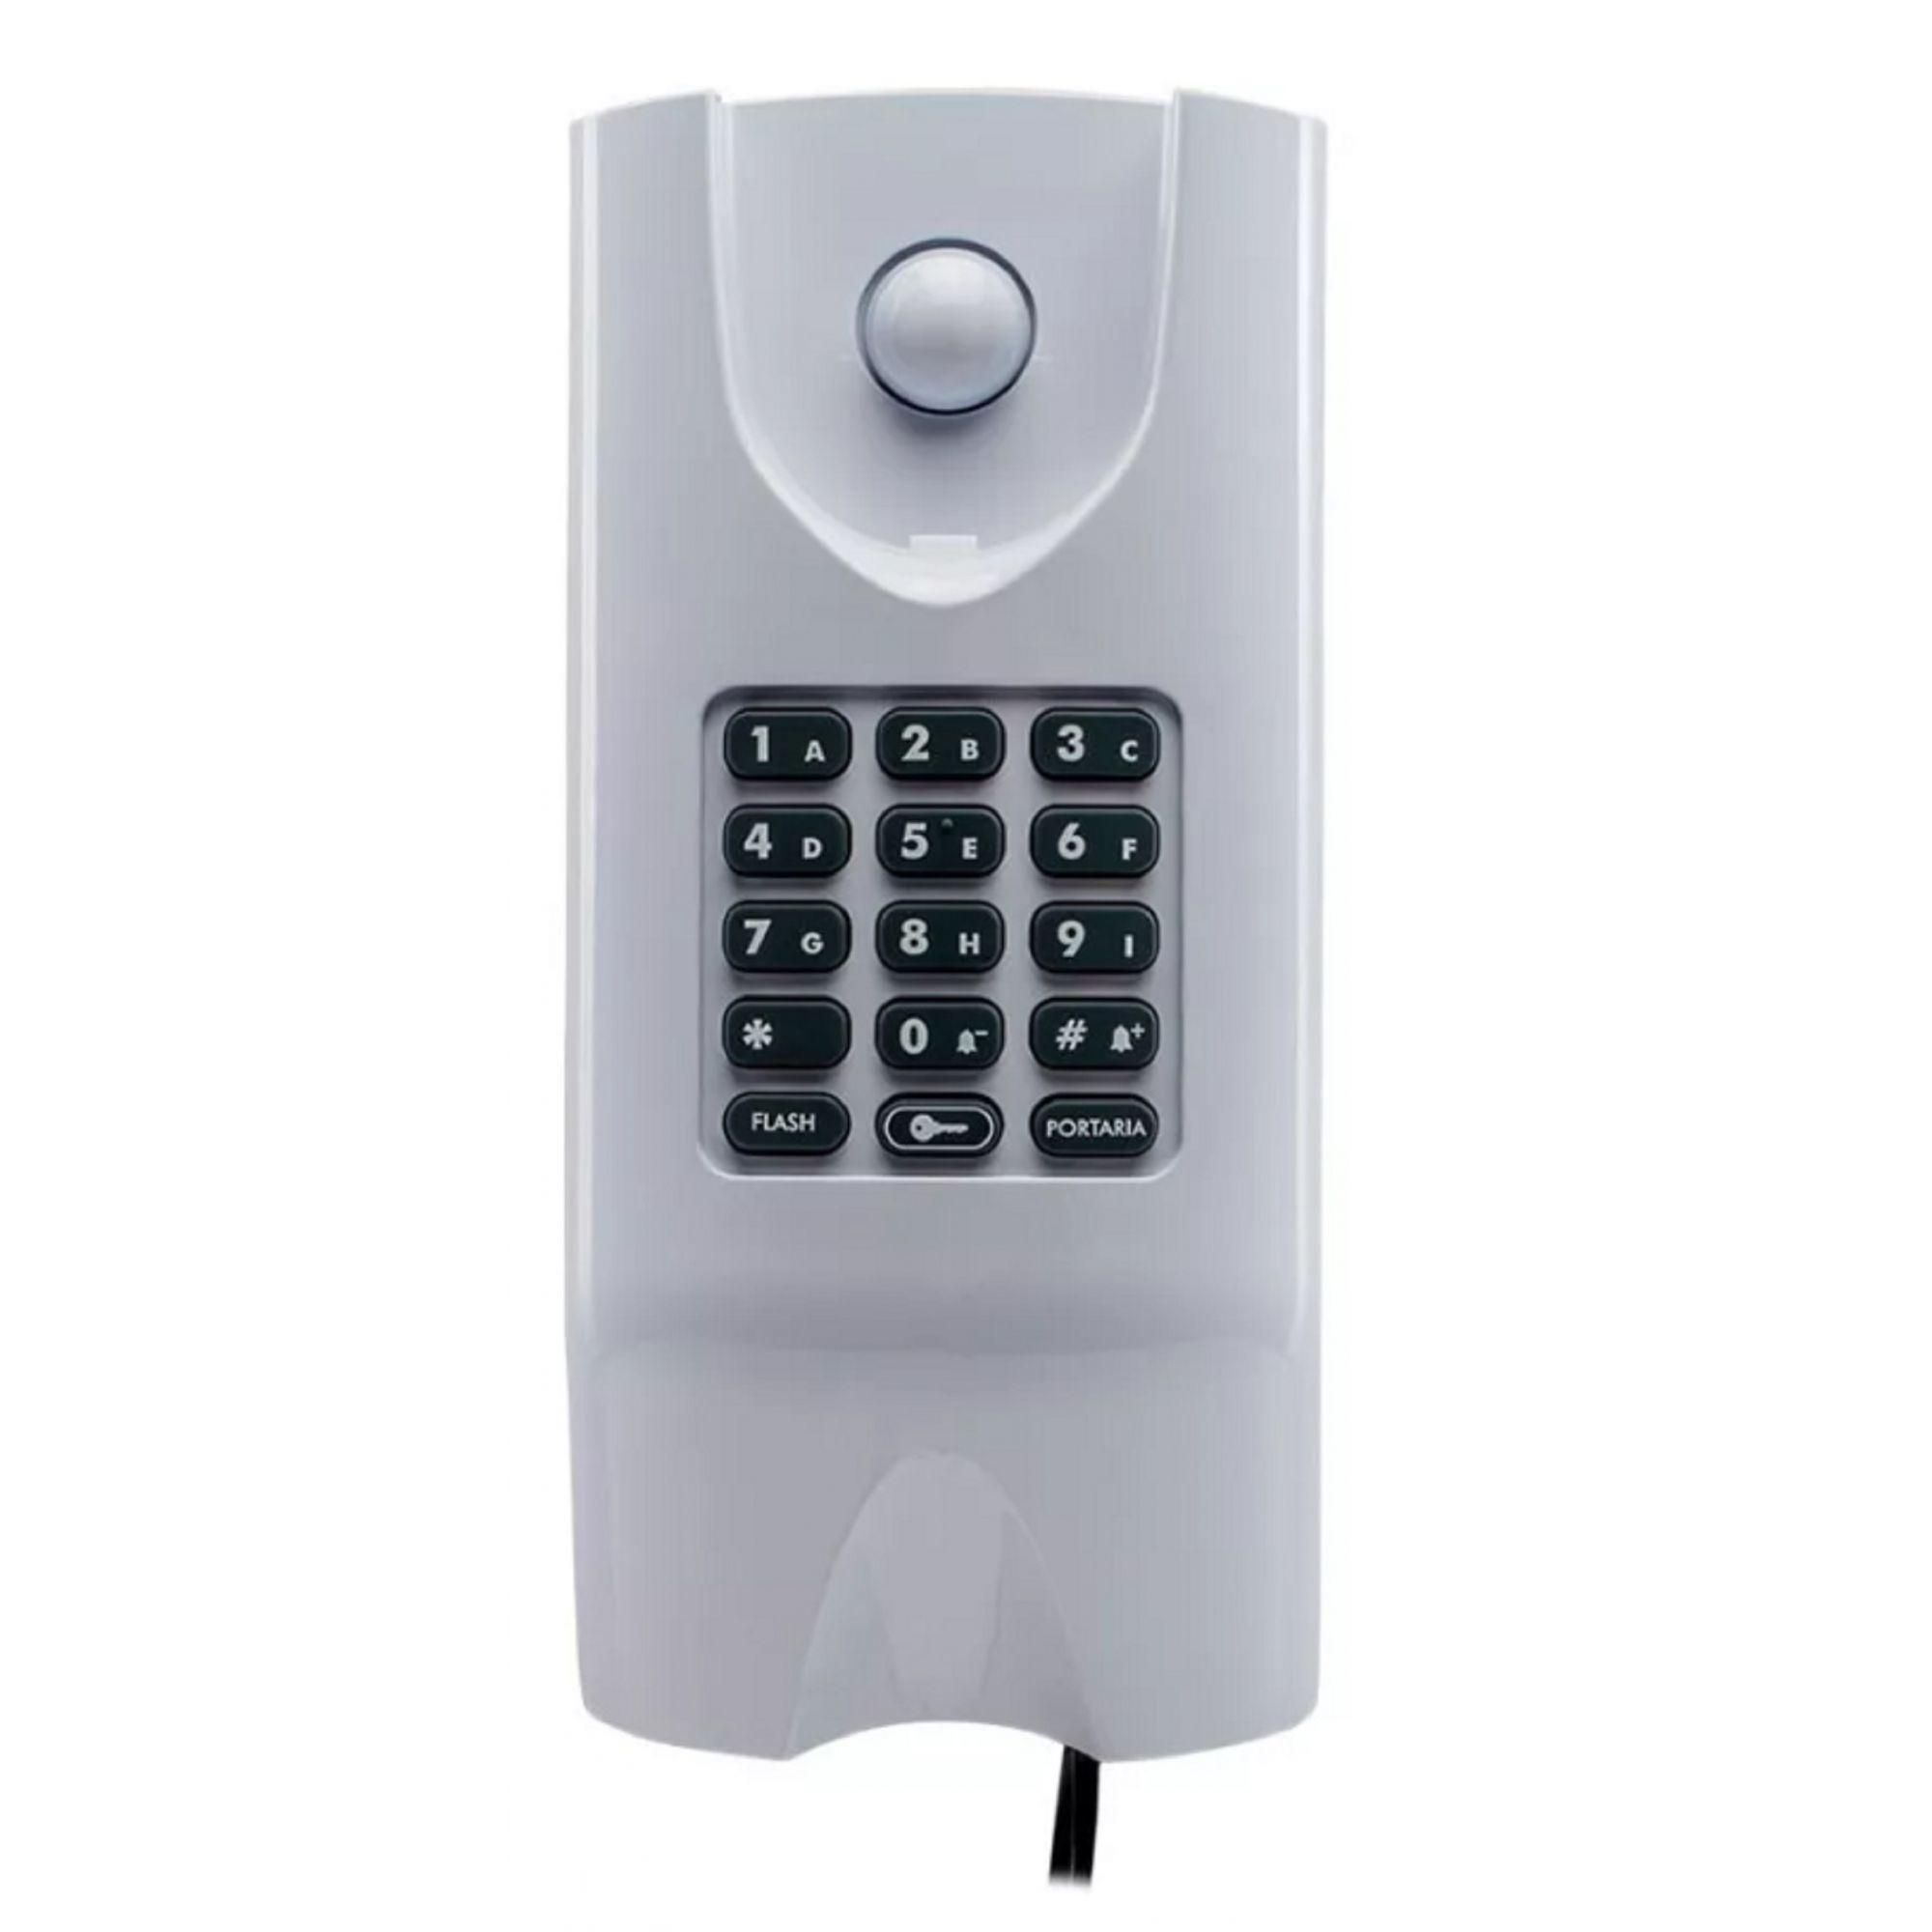 Kit Interfone Coletivo 03 Pontos E Central Comunic Intelbras